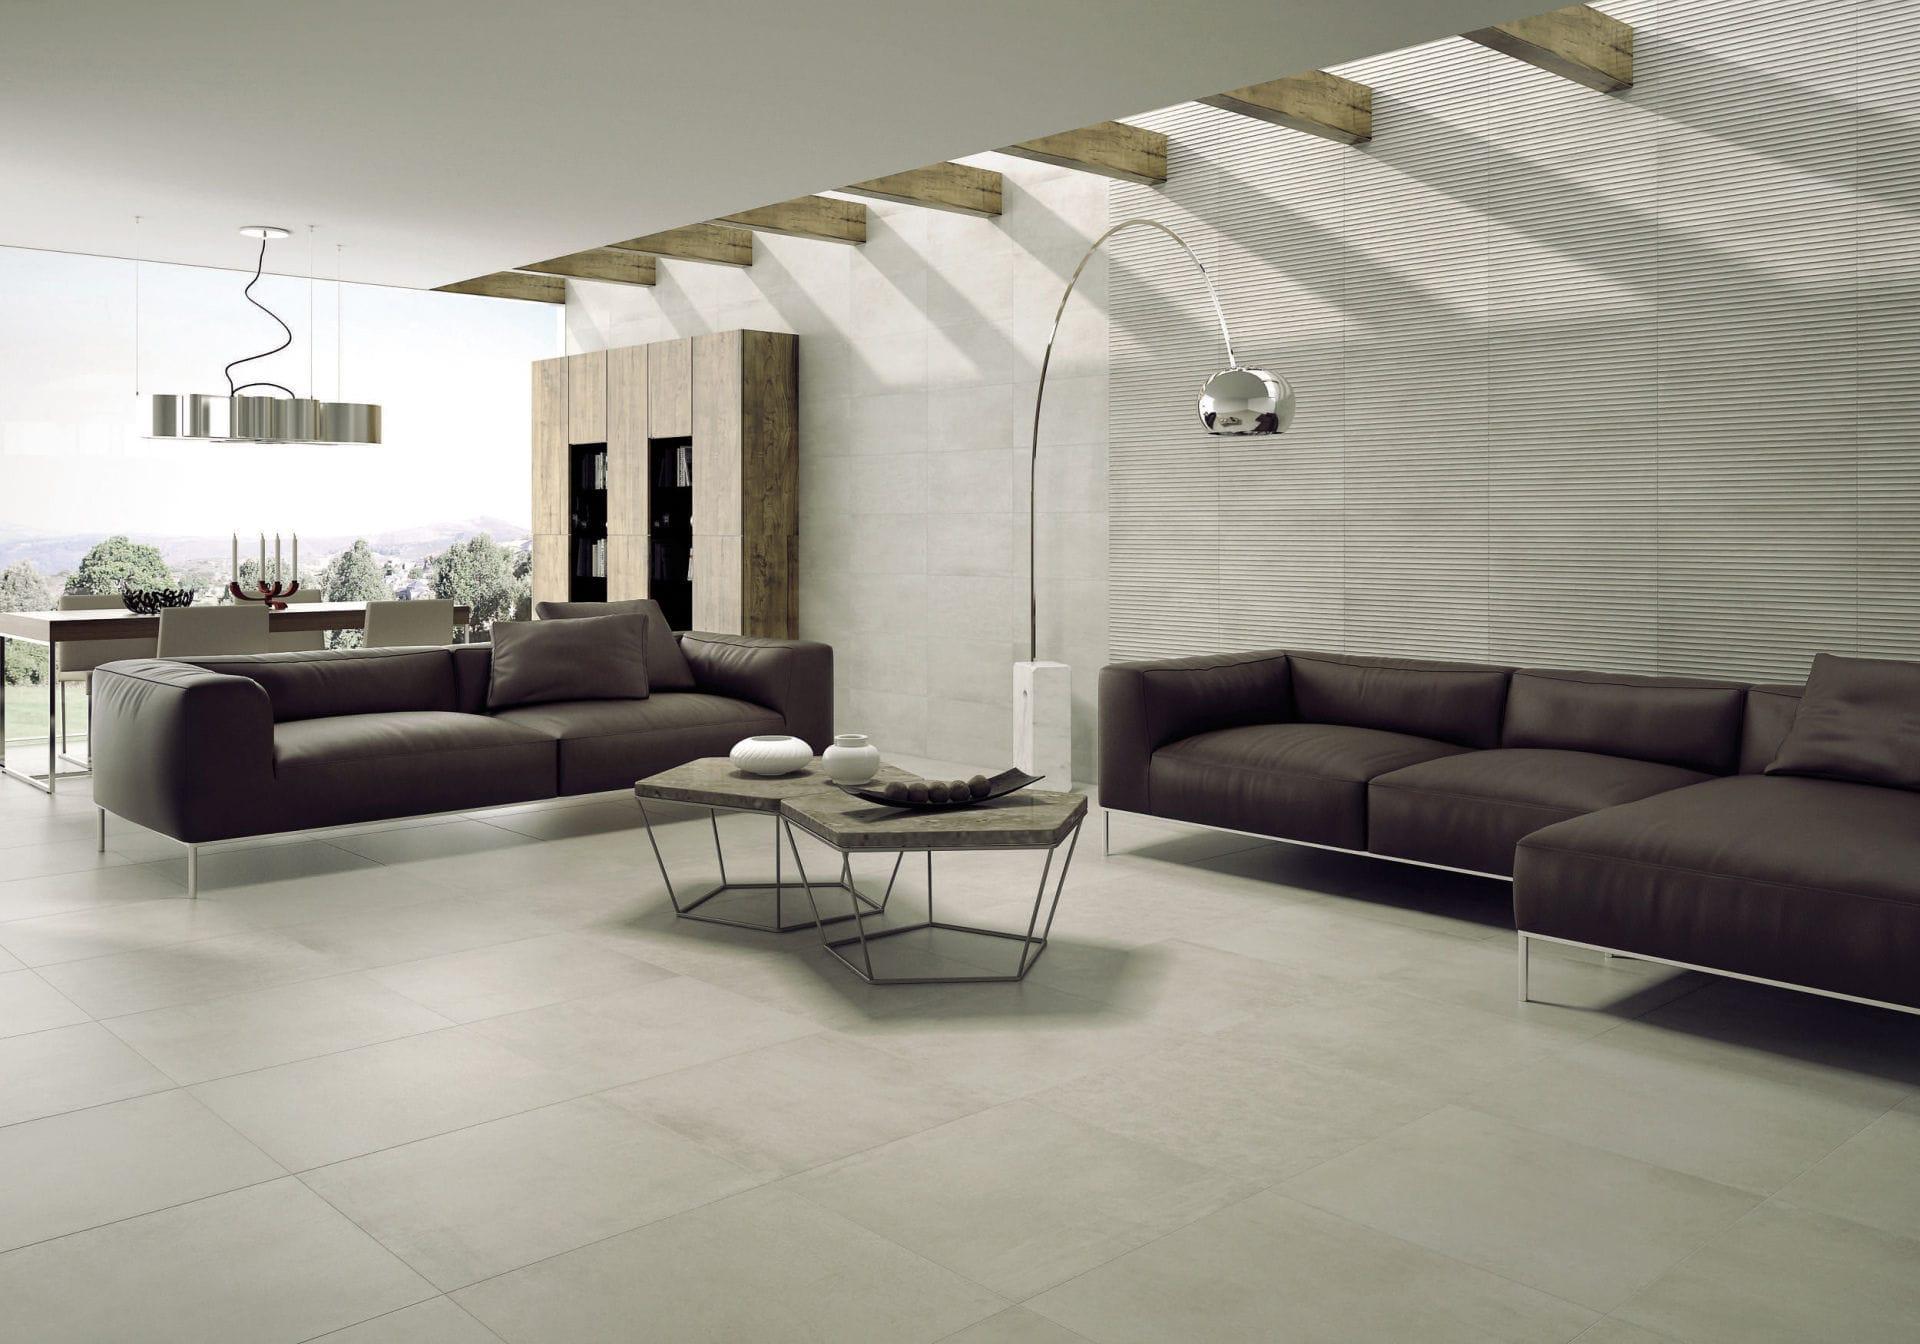 Outdoor tile / wall / floor / porcelain stoneware - ACTIVE - Azulev